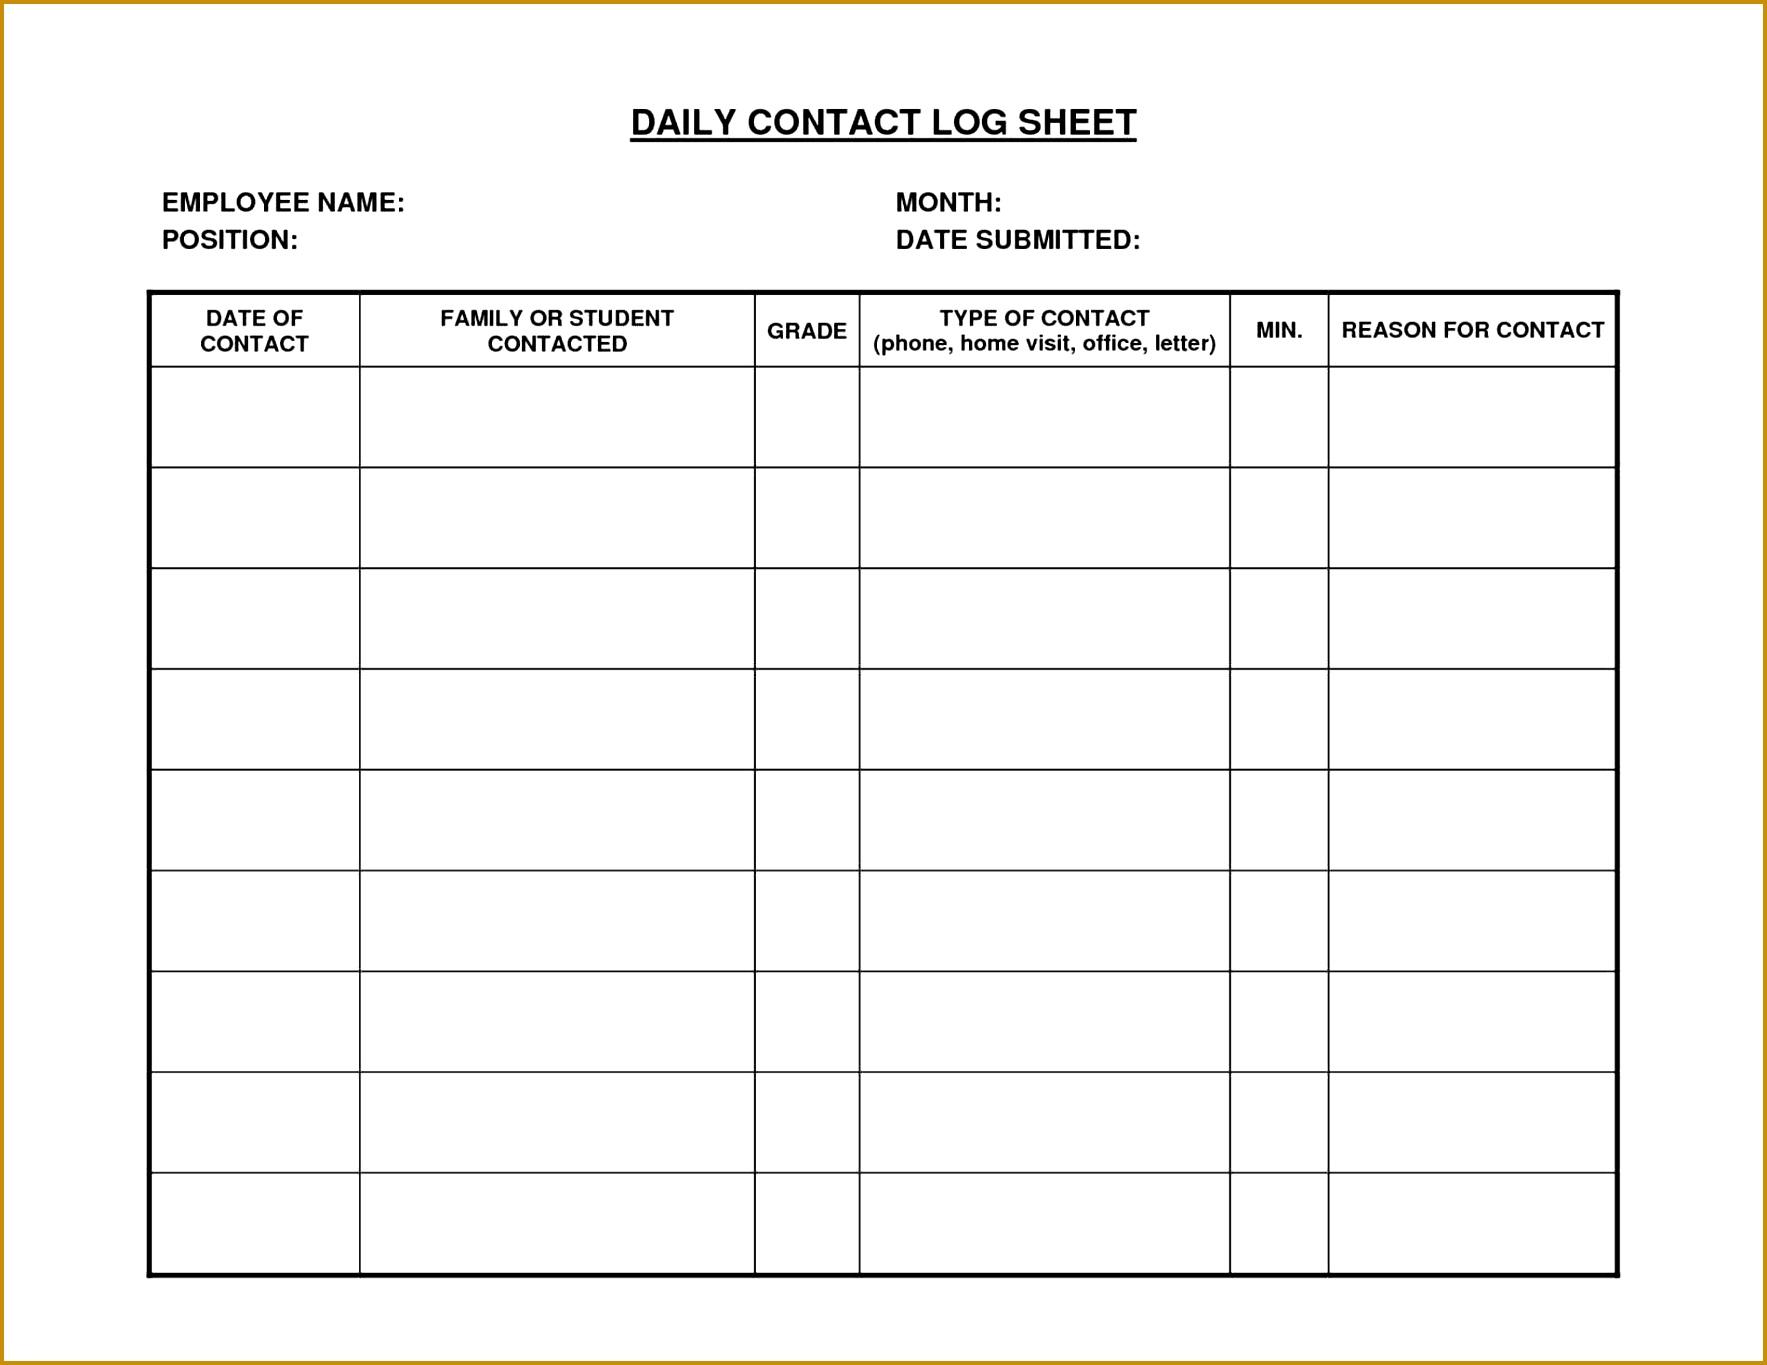 Business Sheet Templates Payroll Sheets Template Resume Sheet Template Business Forms Pinterest Logs Maintenance Memo Templates Maintenance Job Log Sheet 17671365